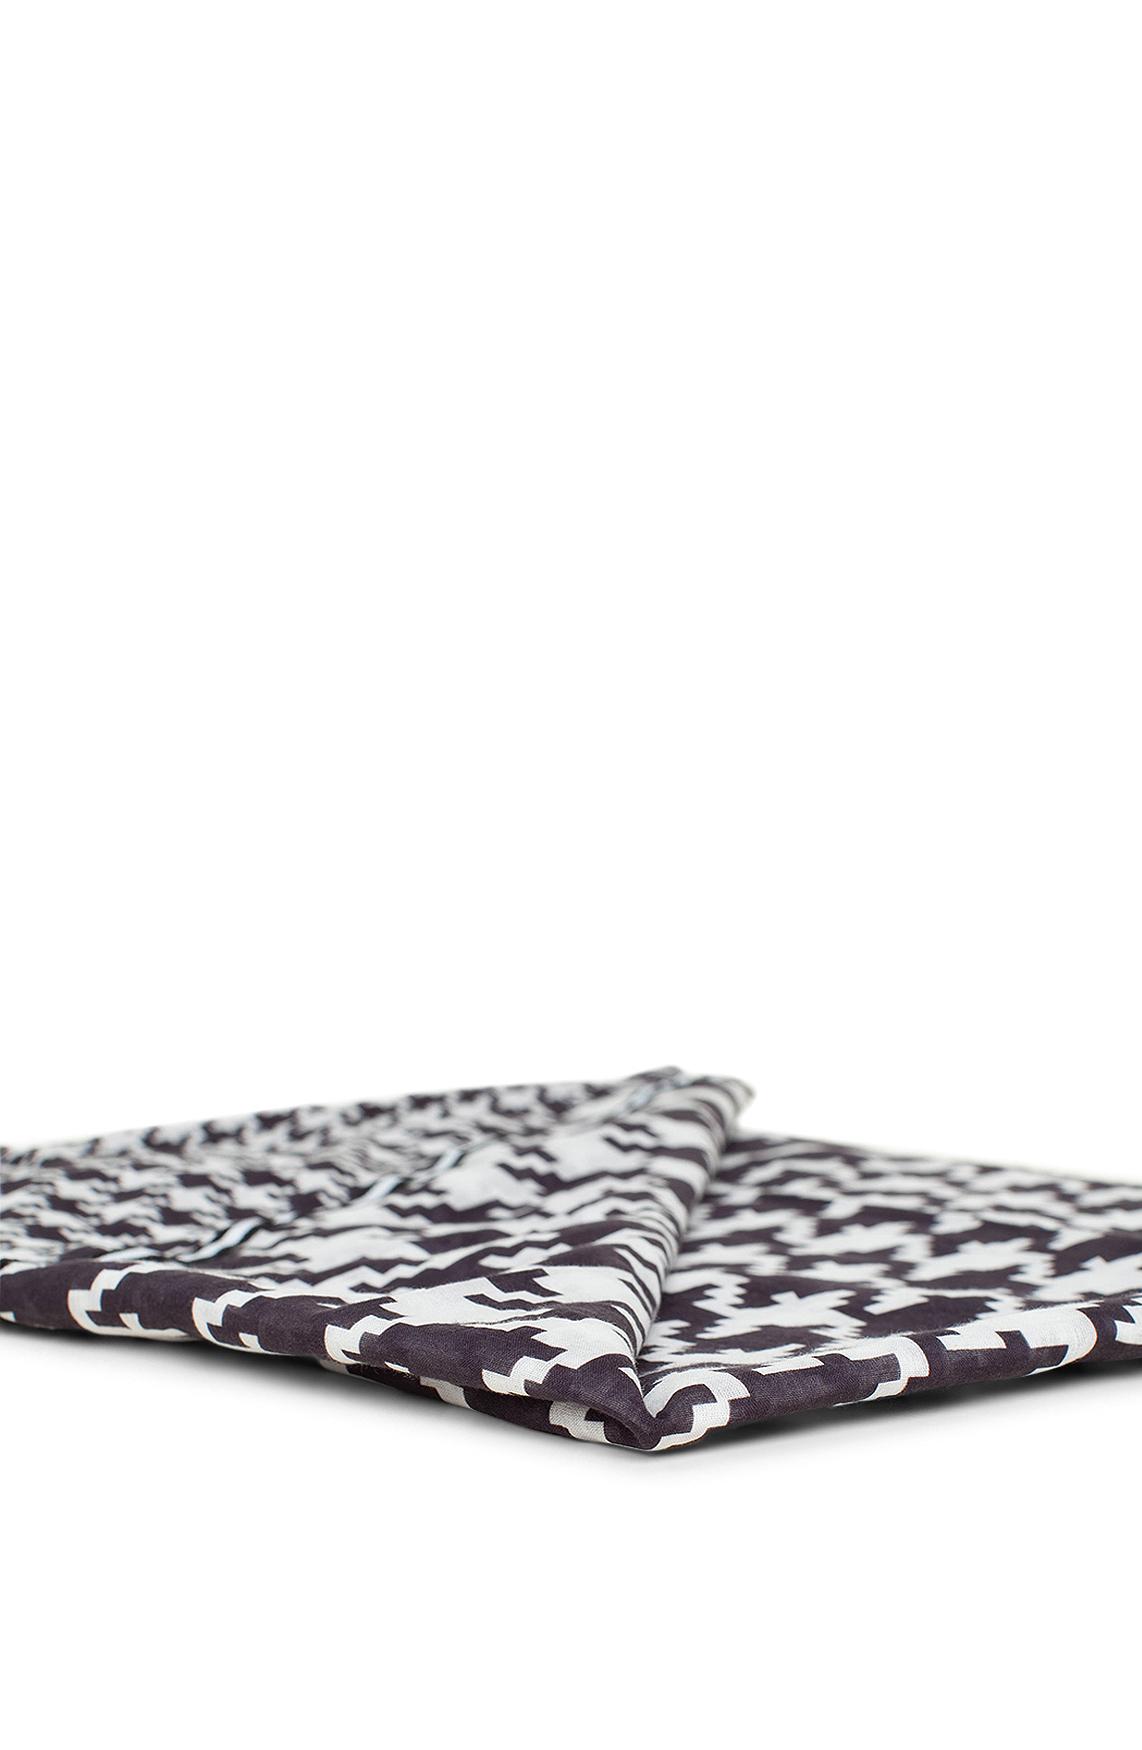 Anna Dames Pied-de-coque shawl zwart